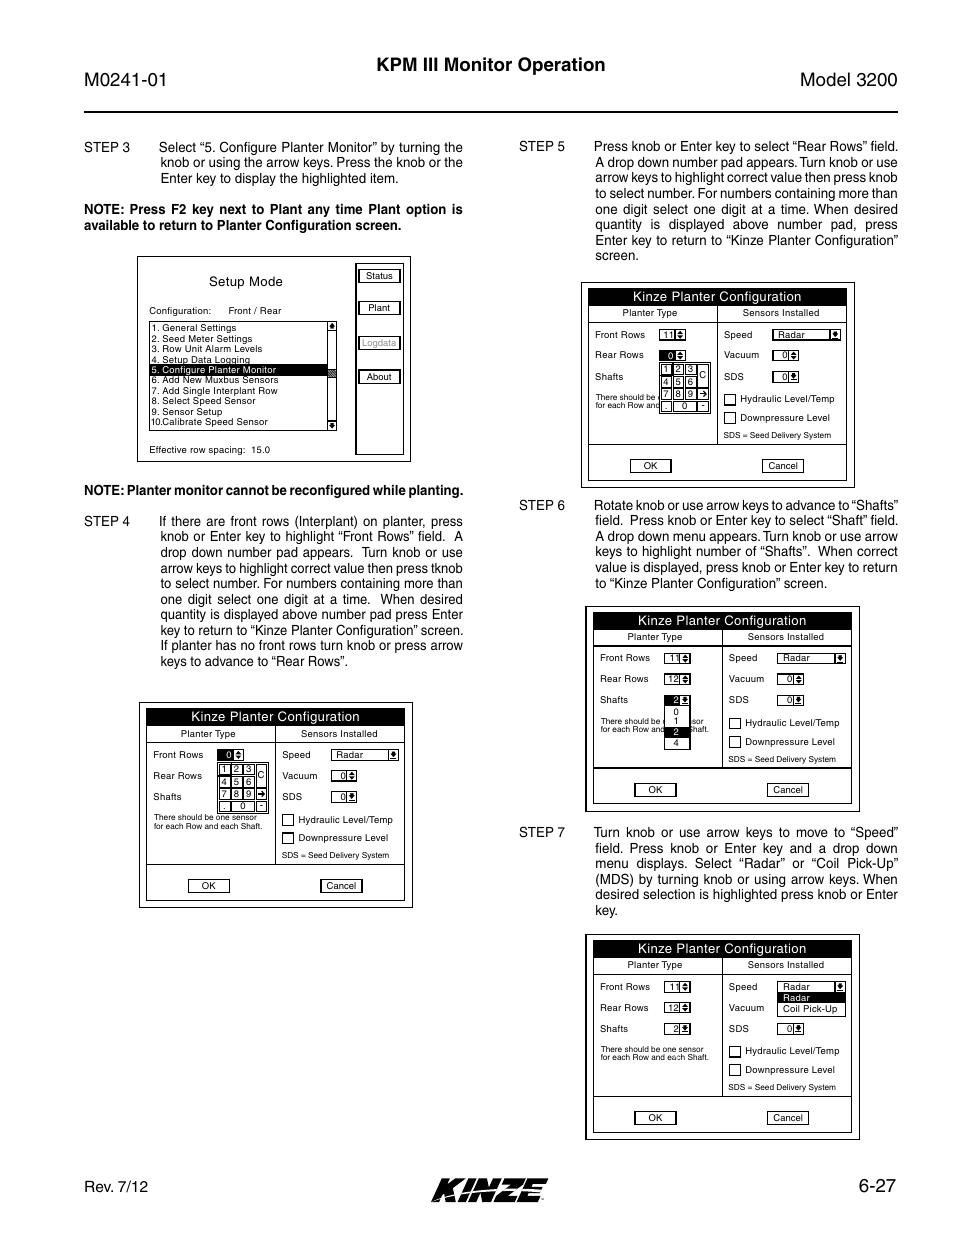 27 kpm iii monitor operation, Rev. 7/12 | Kinze 3200 Wing-